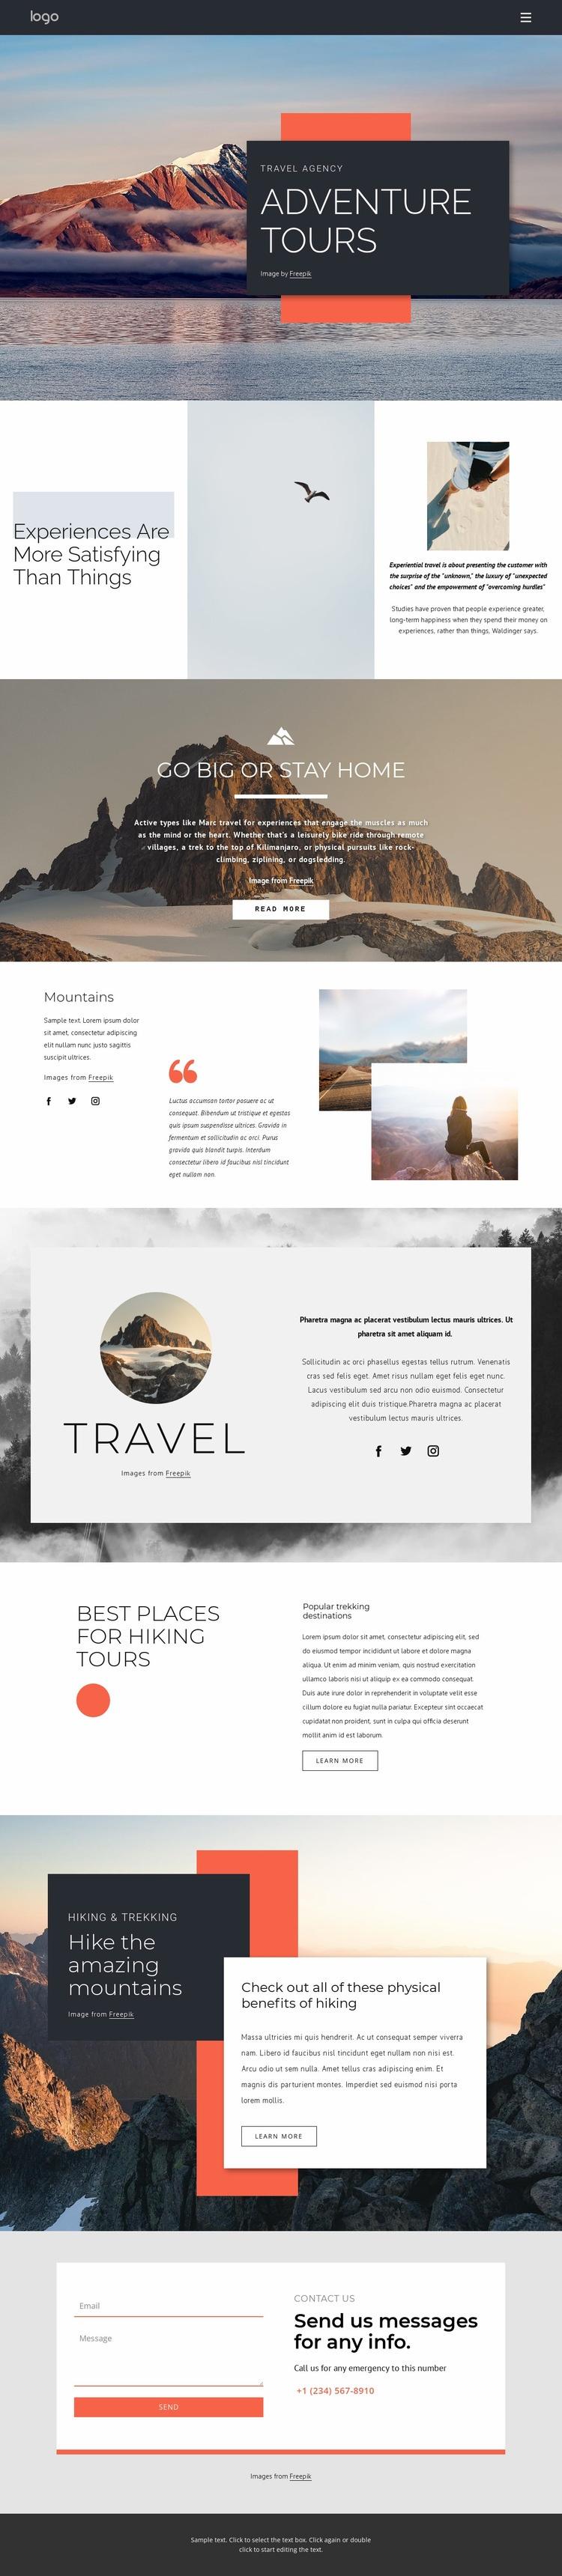 We provide hiking tours Web Page Designer